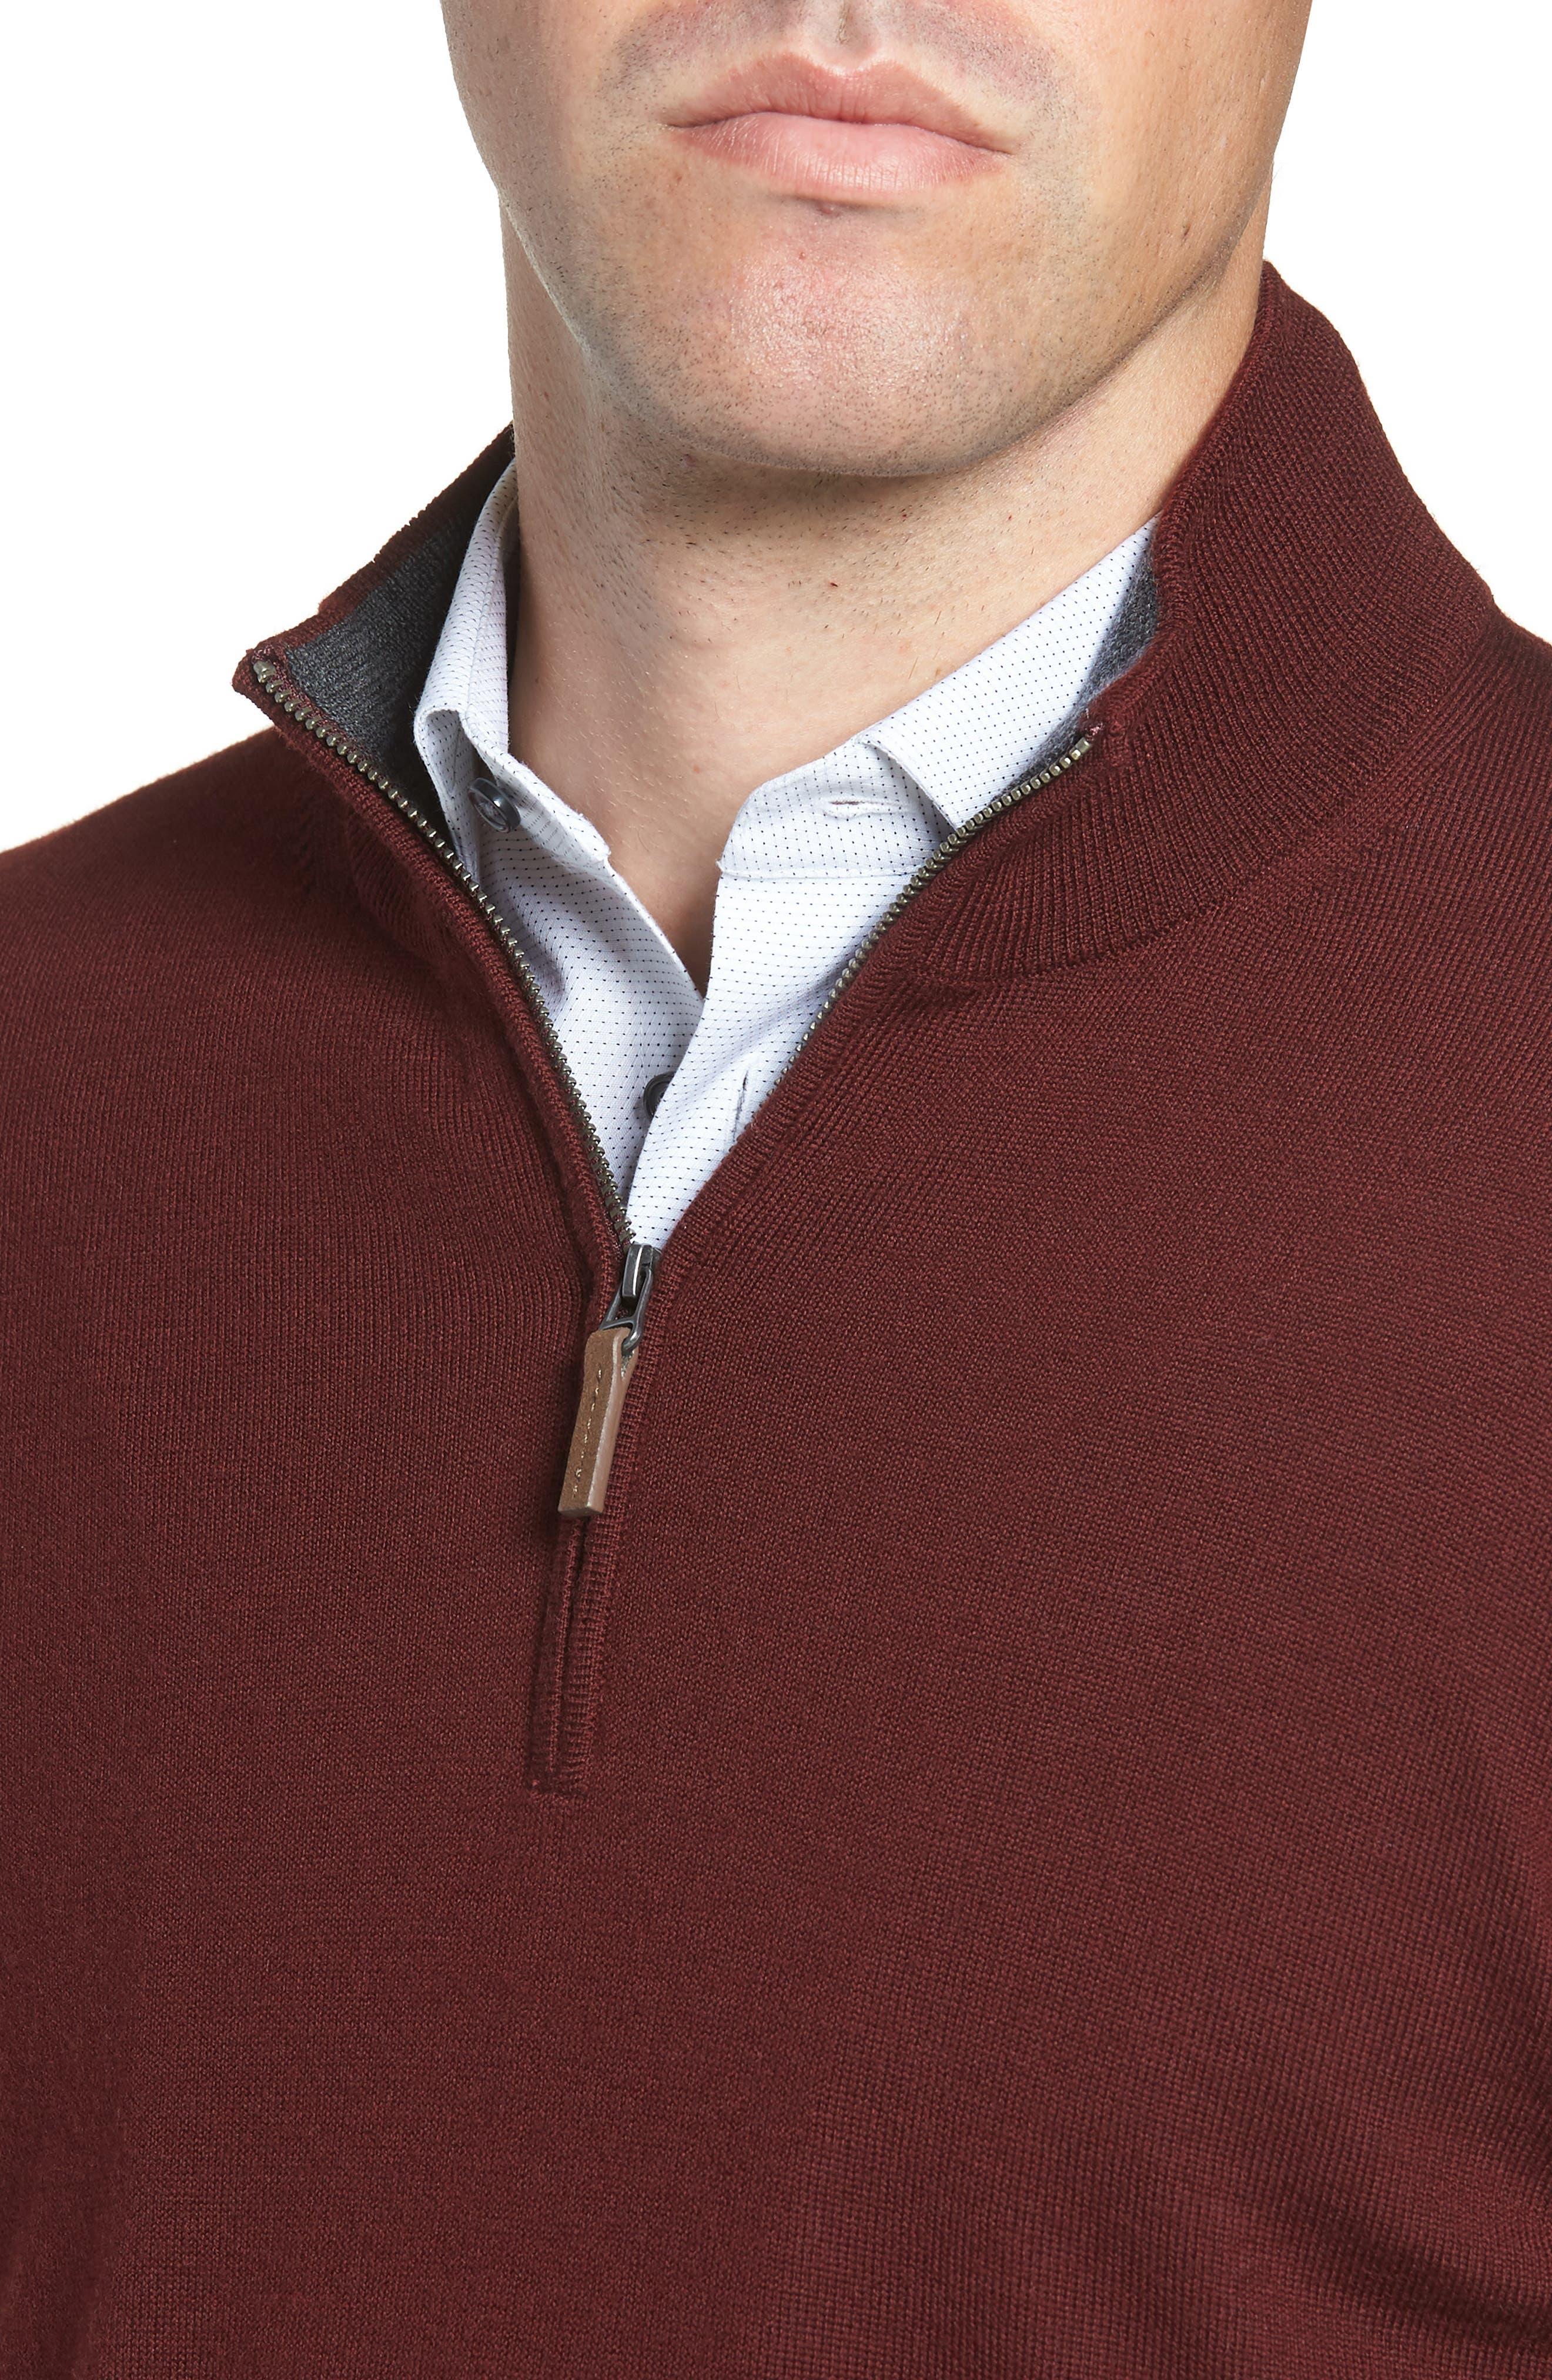 Quarter Zip Wool Pullover,                             Alternate thumbnail 4, color,                             BURGUNDY ROYALE